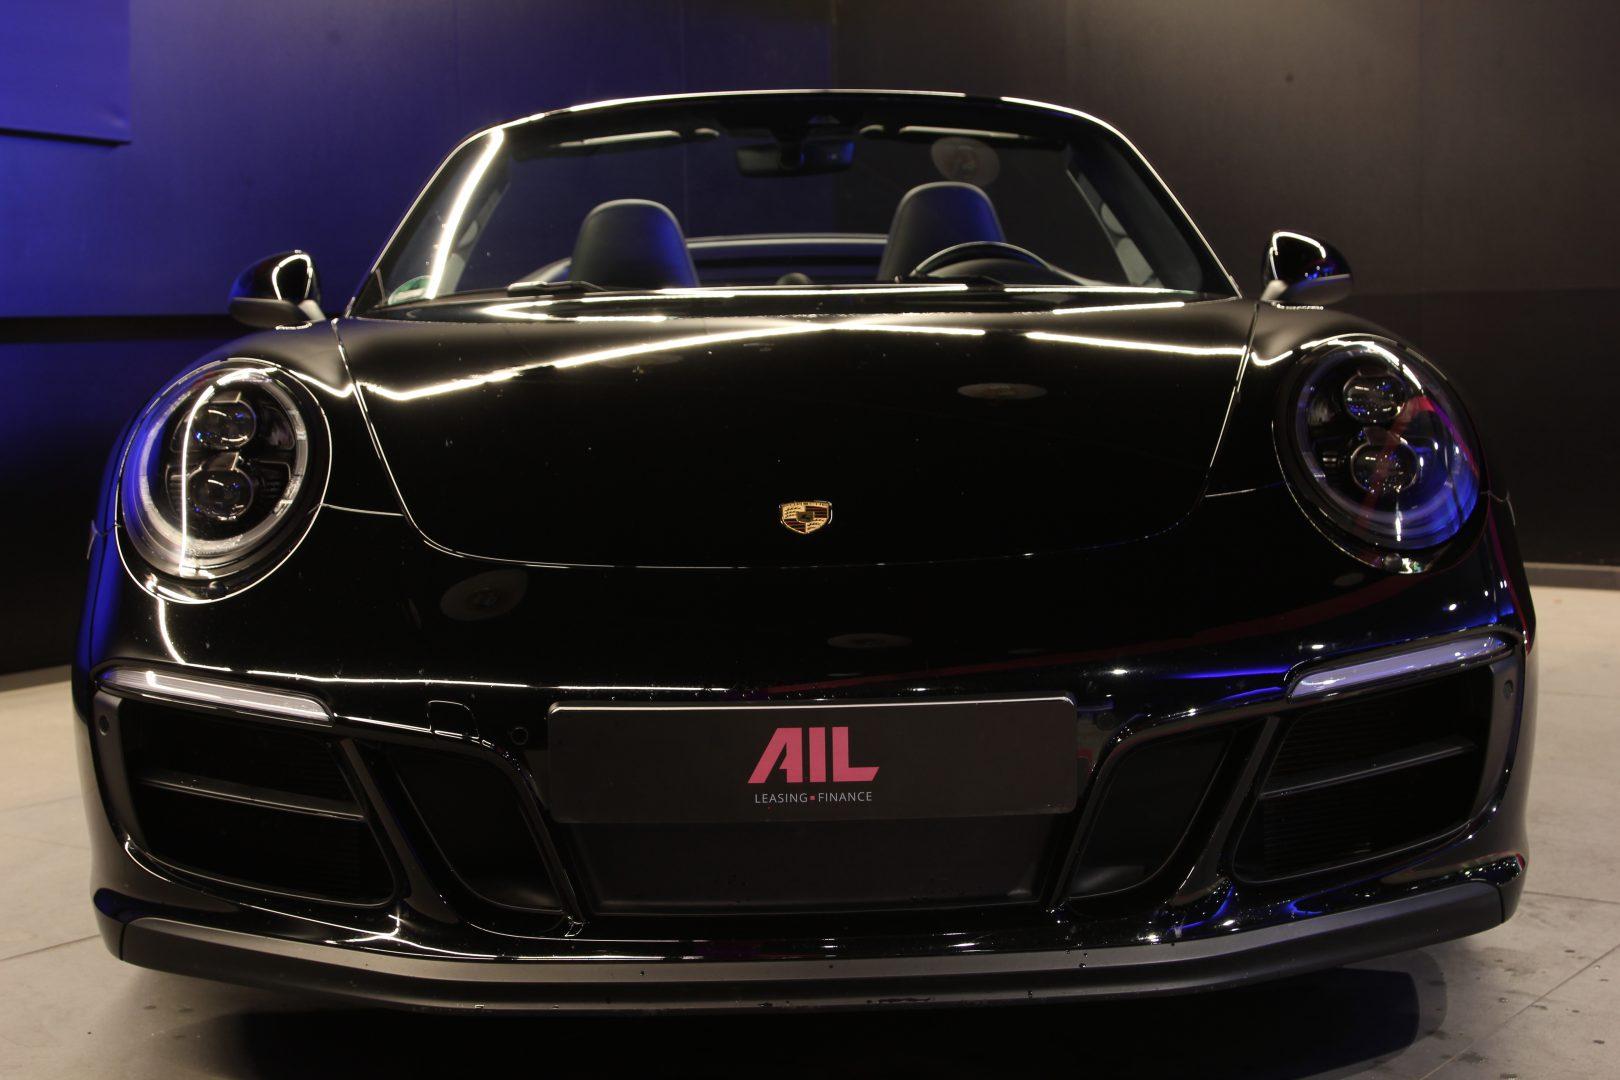 AIL Porsche 991 4 GTS Cabriolet LED Burmester High-End 7